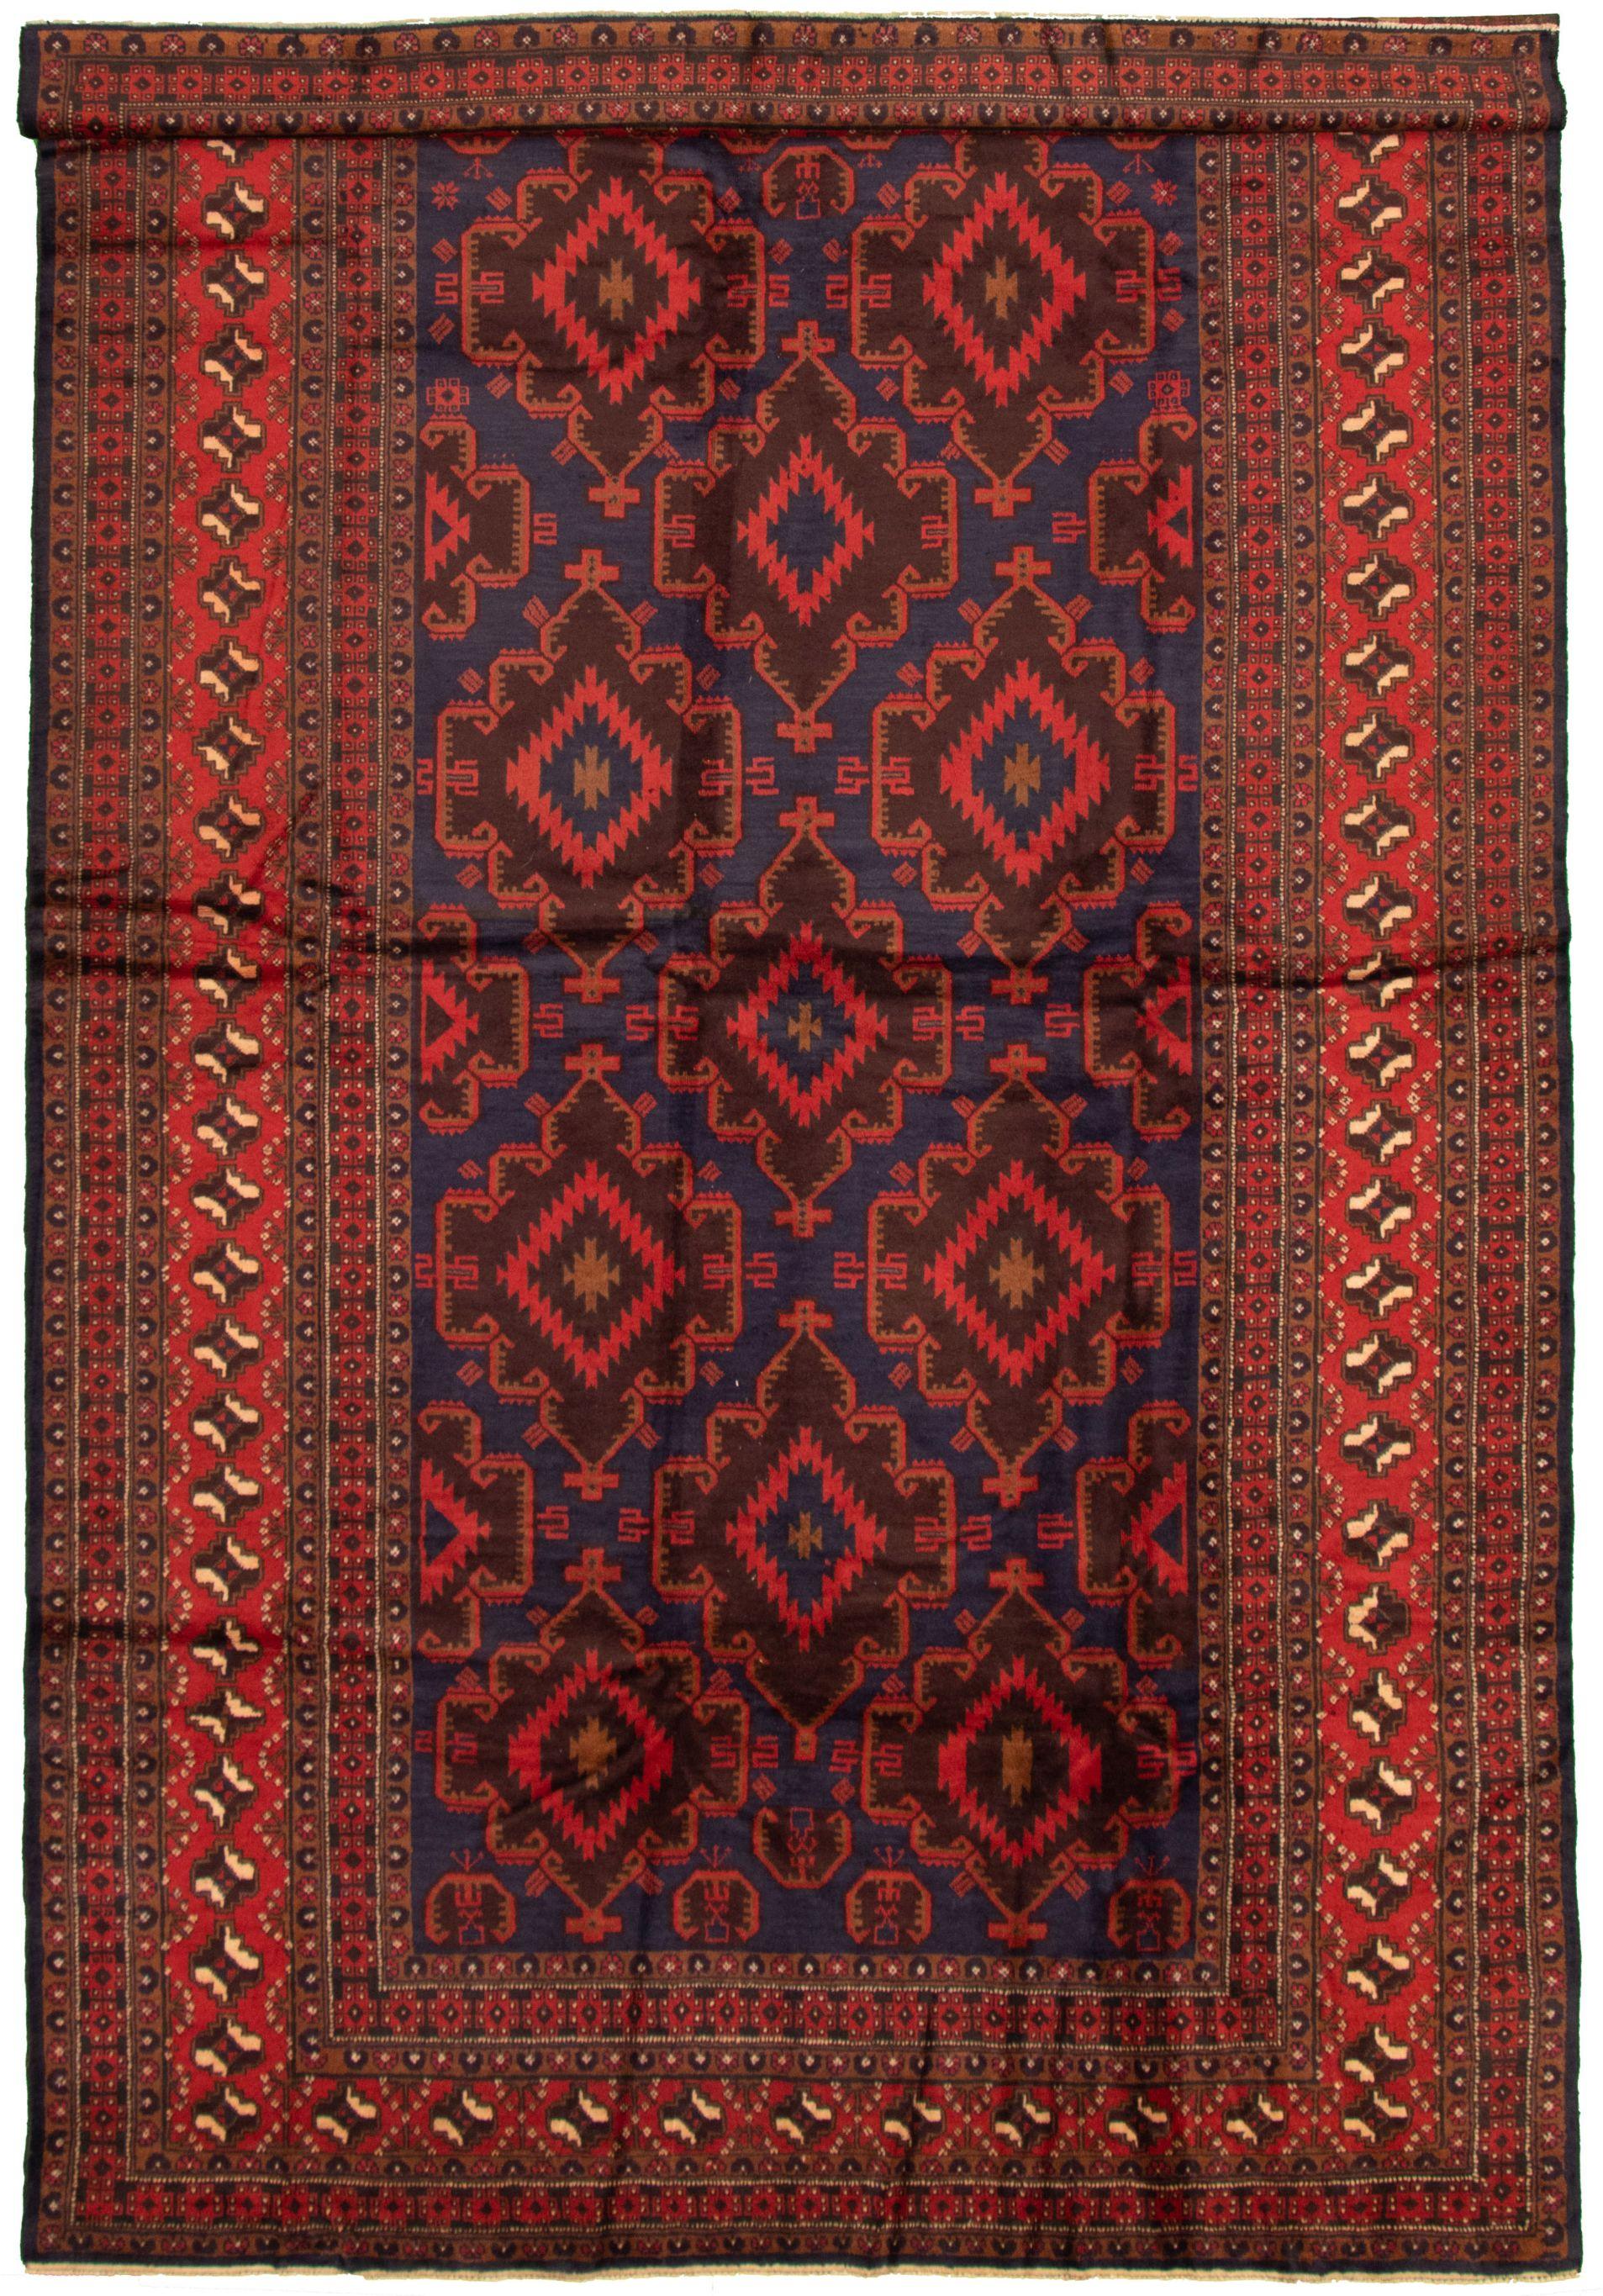 "Hand-knotted Teimani Dark Blue Wool Rug 7'9"" x 12'10"" Size: 7'9"" x 12'10"""